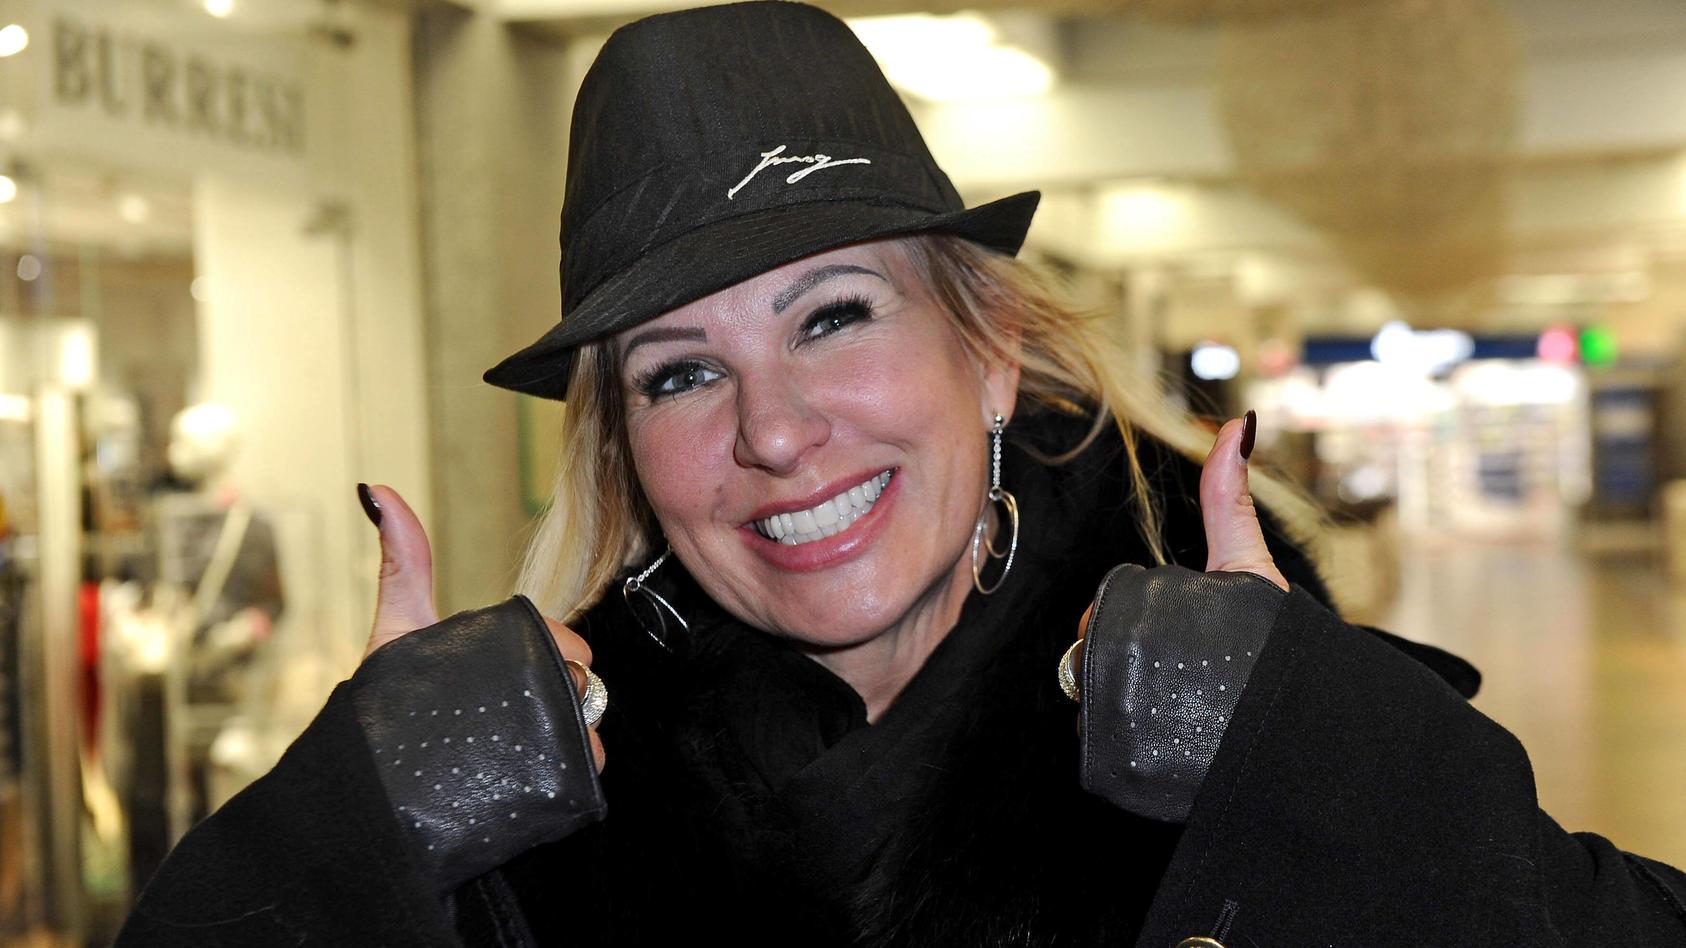 Datet Claudia Norberg einen Autohändler?